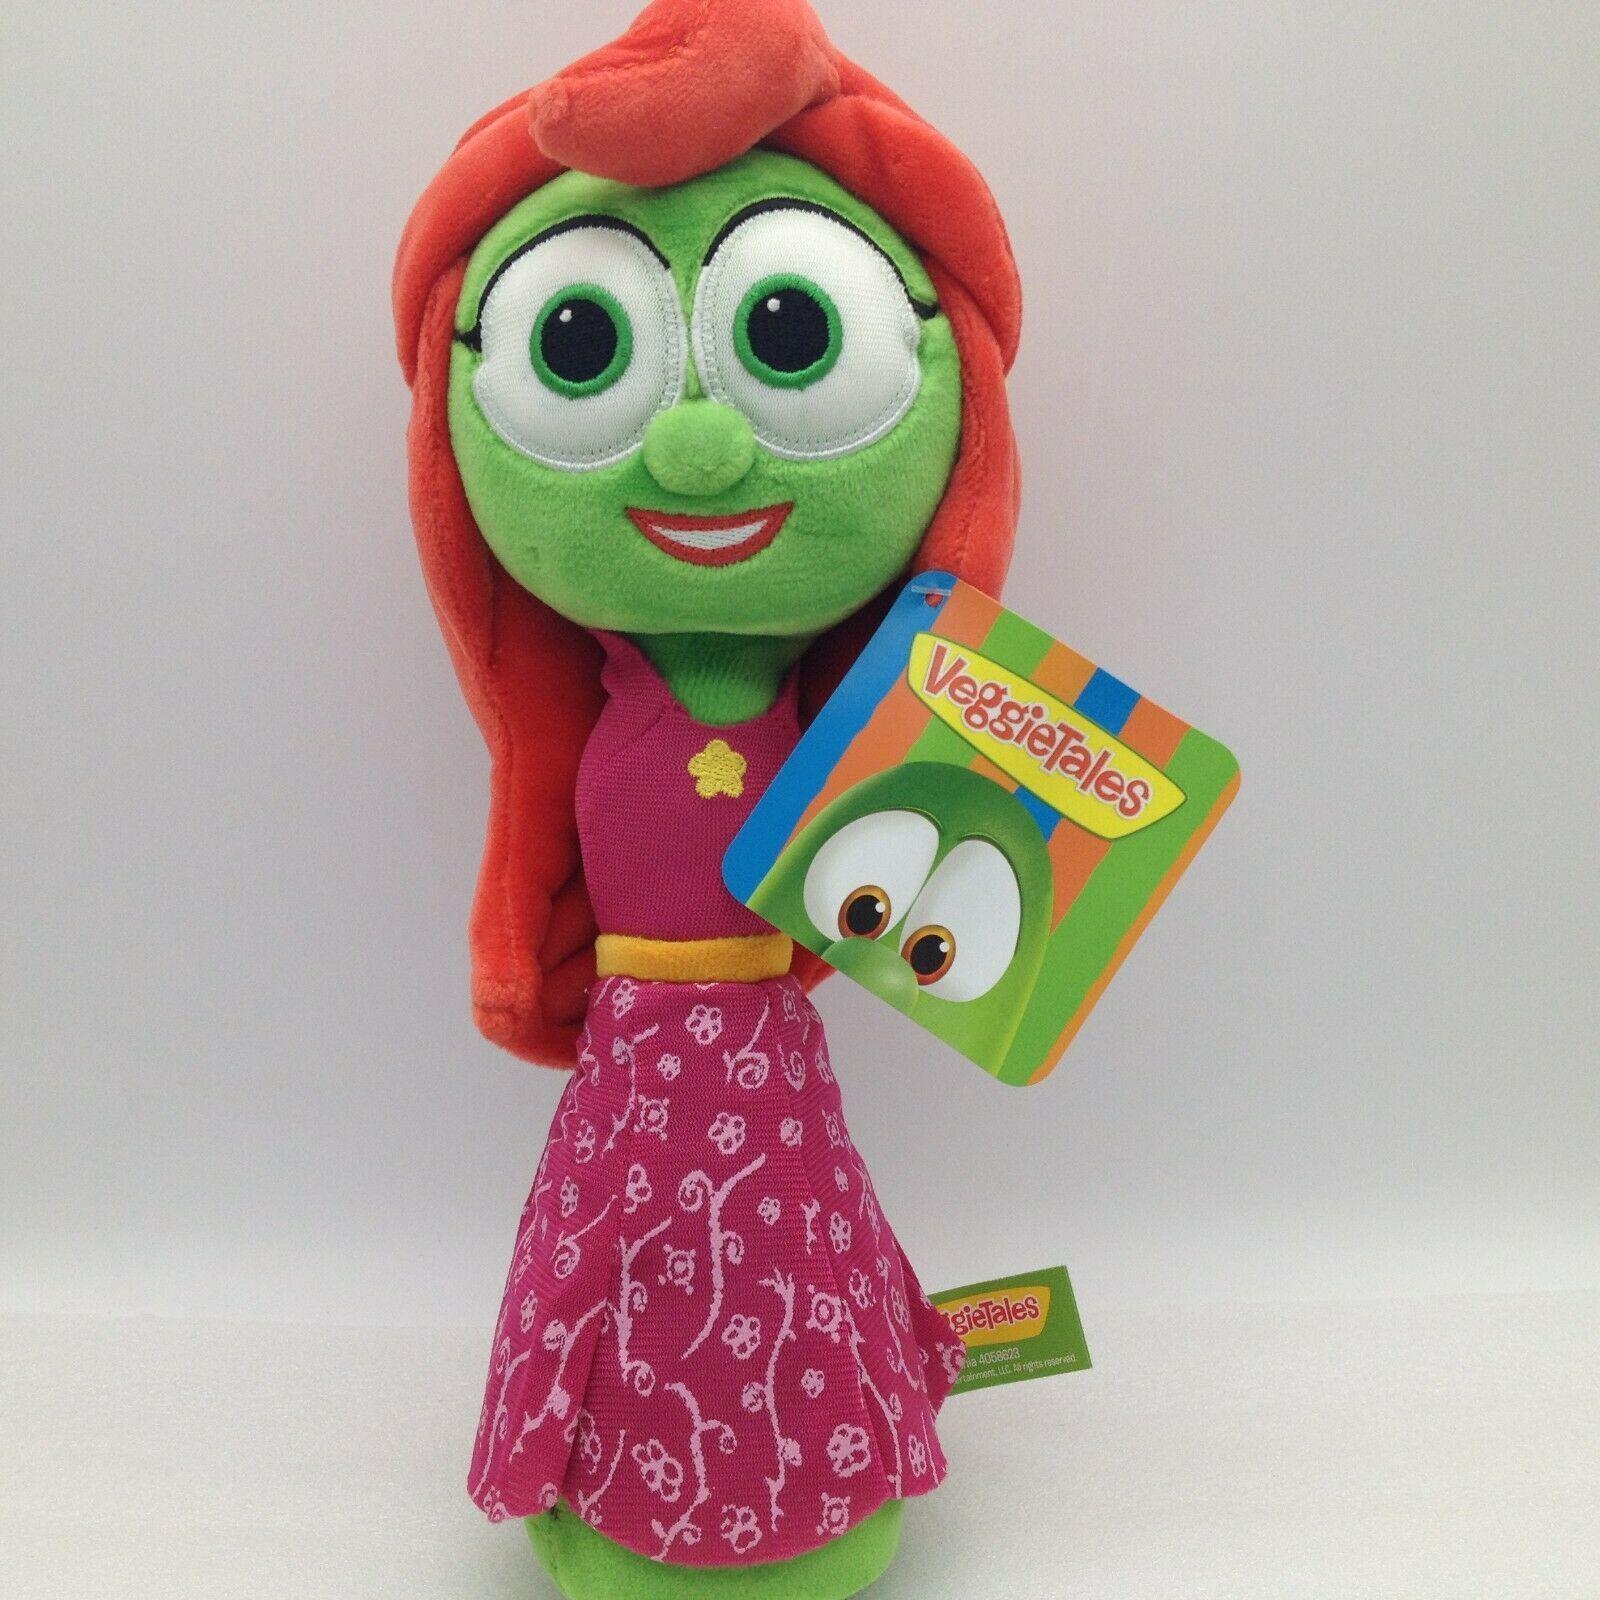 "Enesco Veggietales Petunia Rhubarb Plush Doll Toy 11"" Tall Super Soft Veggie image 3"